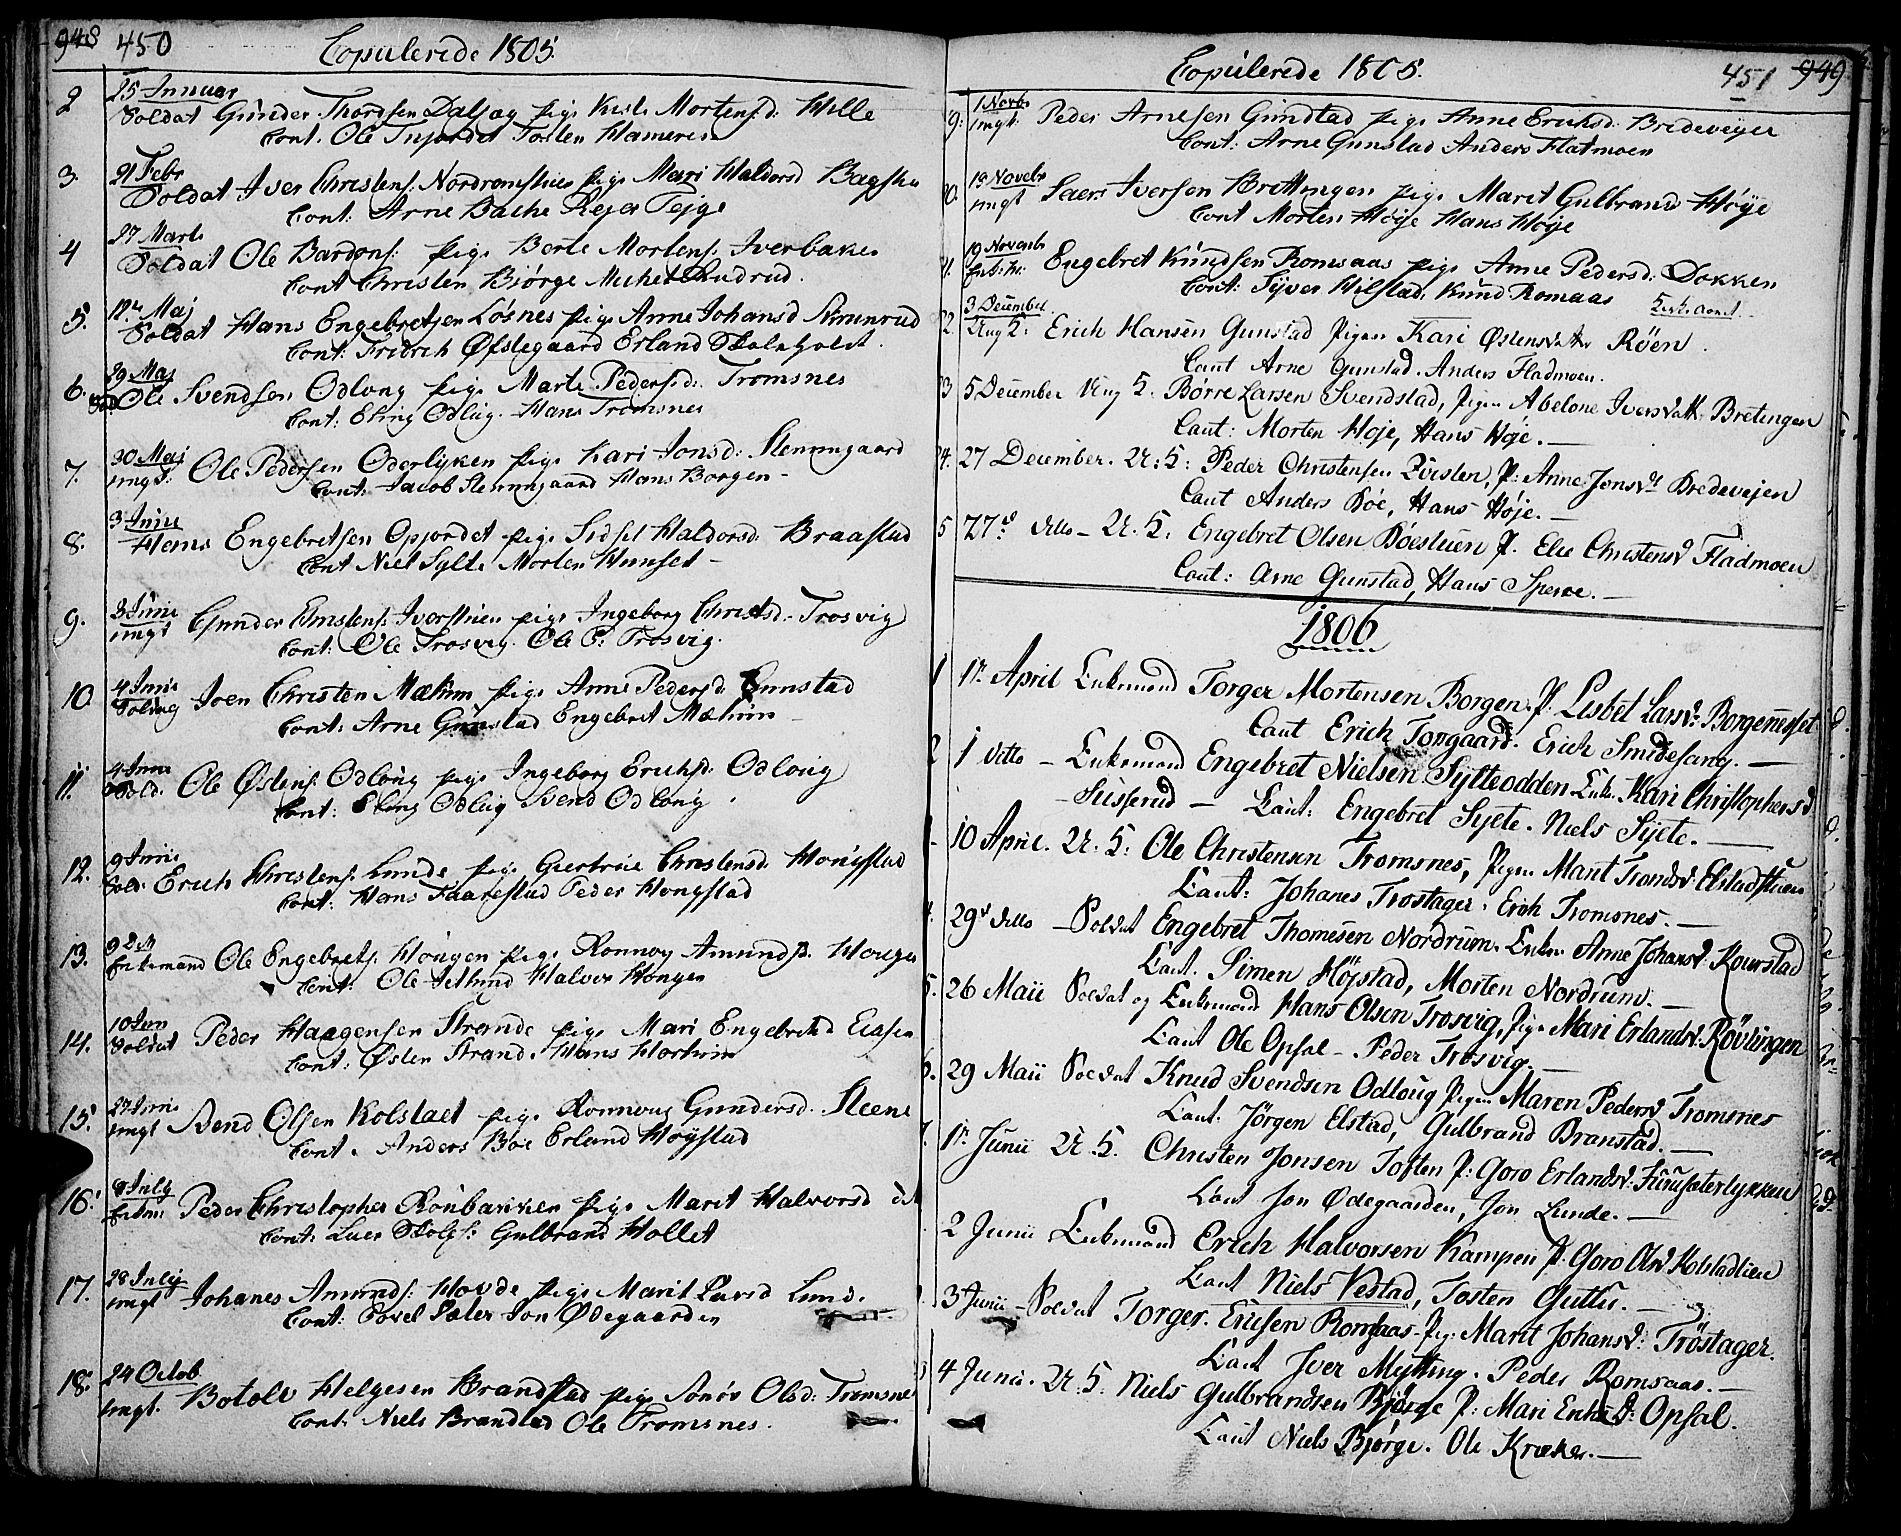 SAH, Ringebu prestekontor, Ministerialbok nr. 3, 1781-1820, s. 450-451